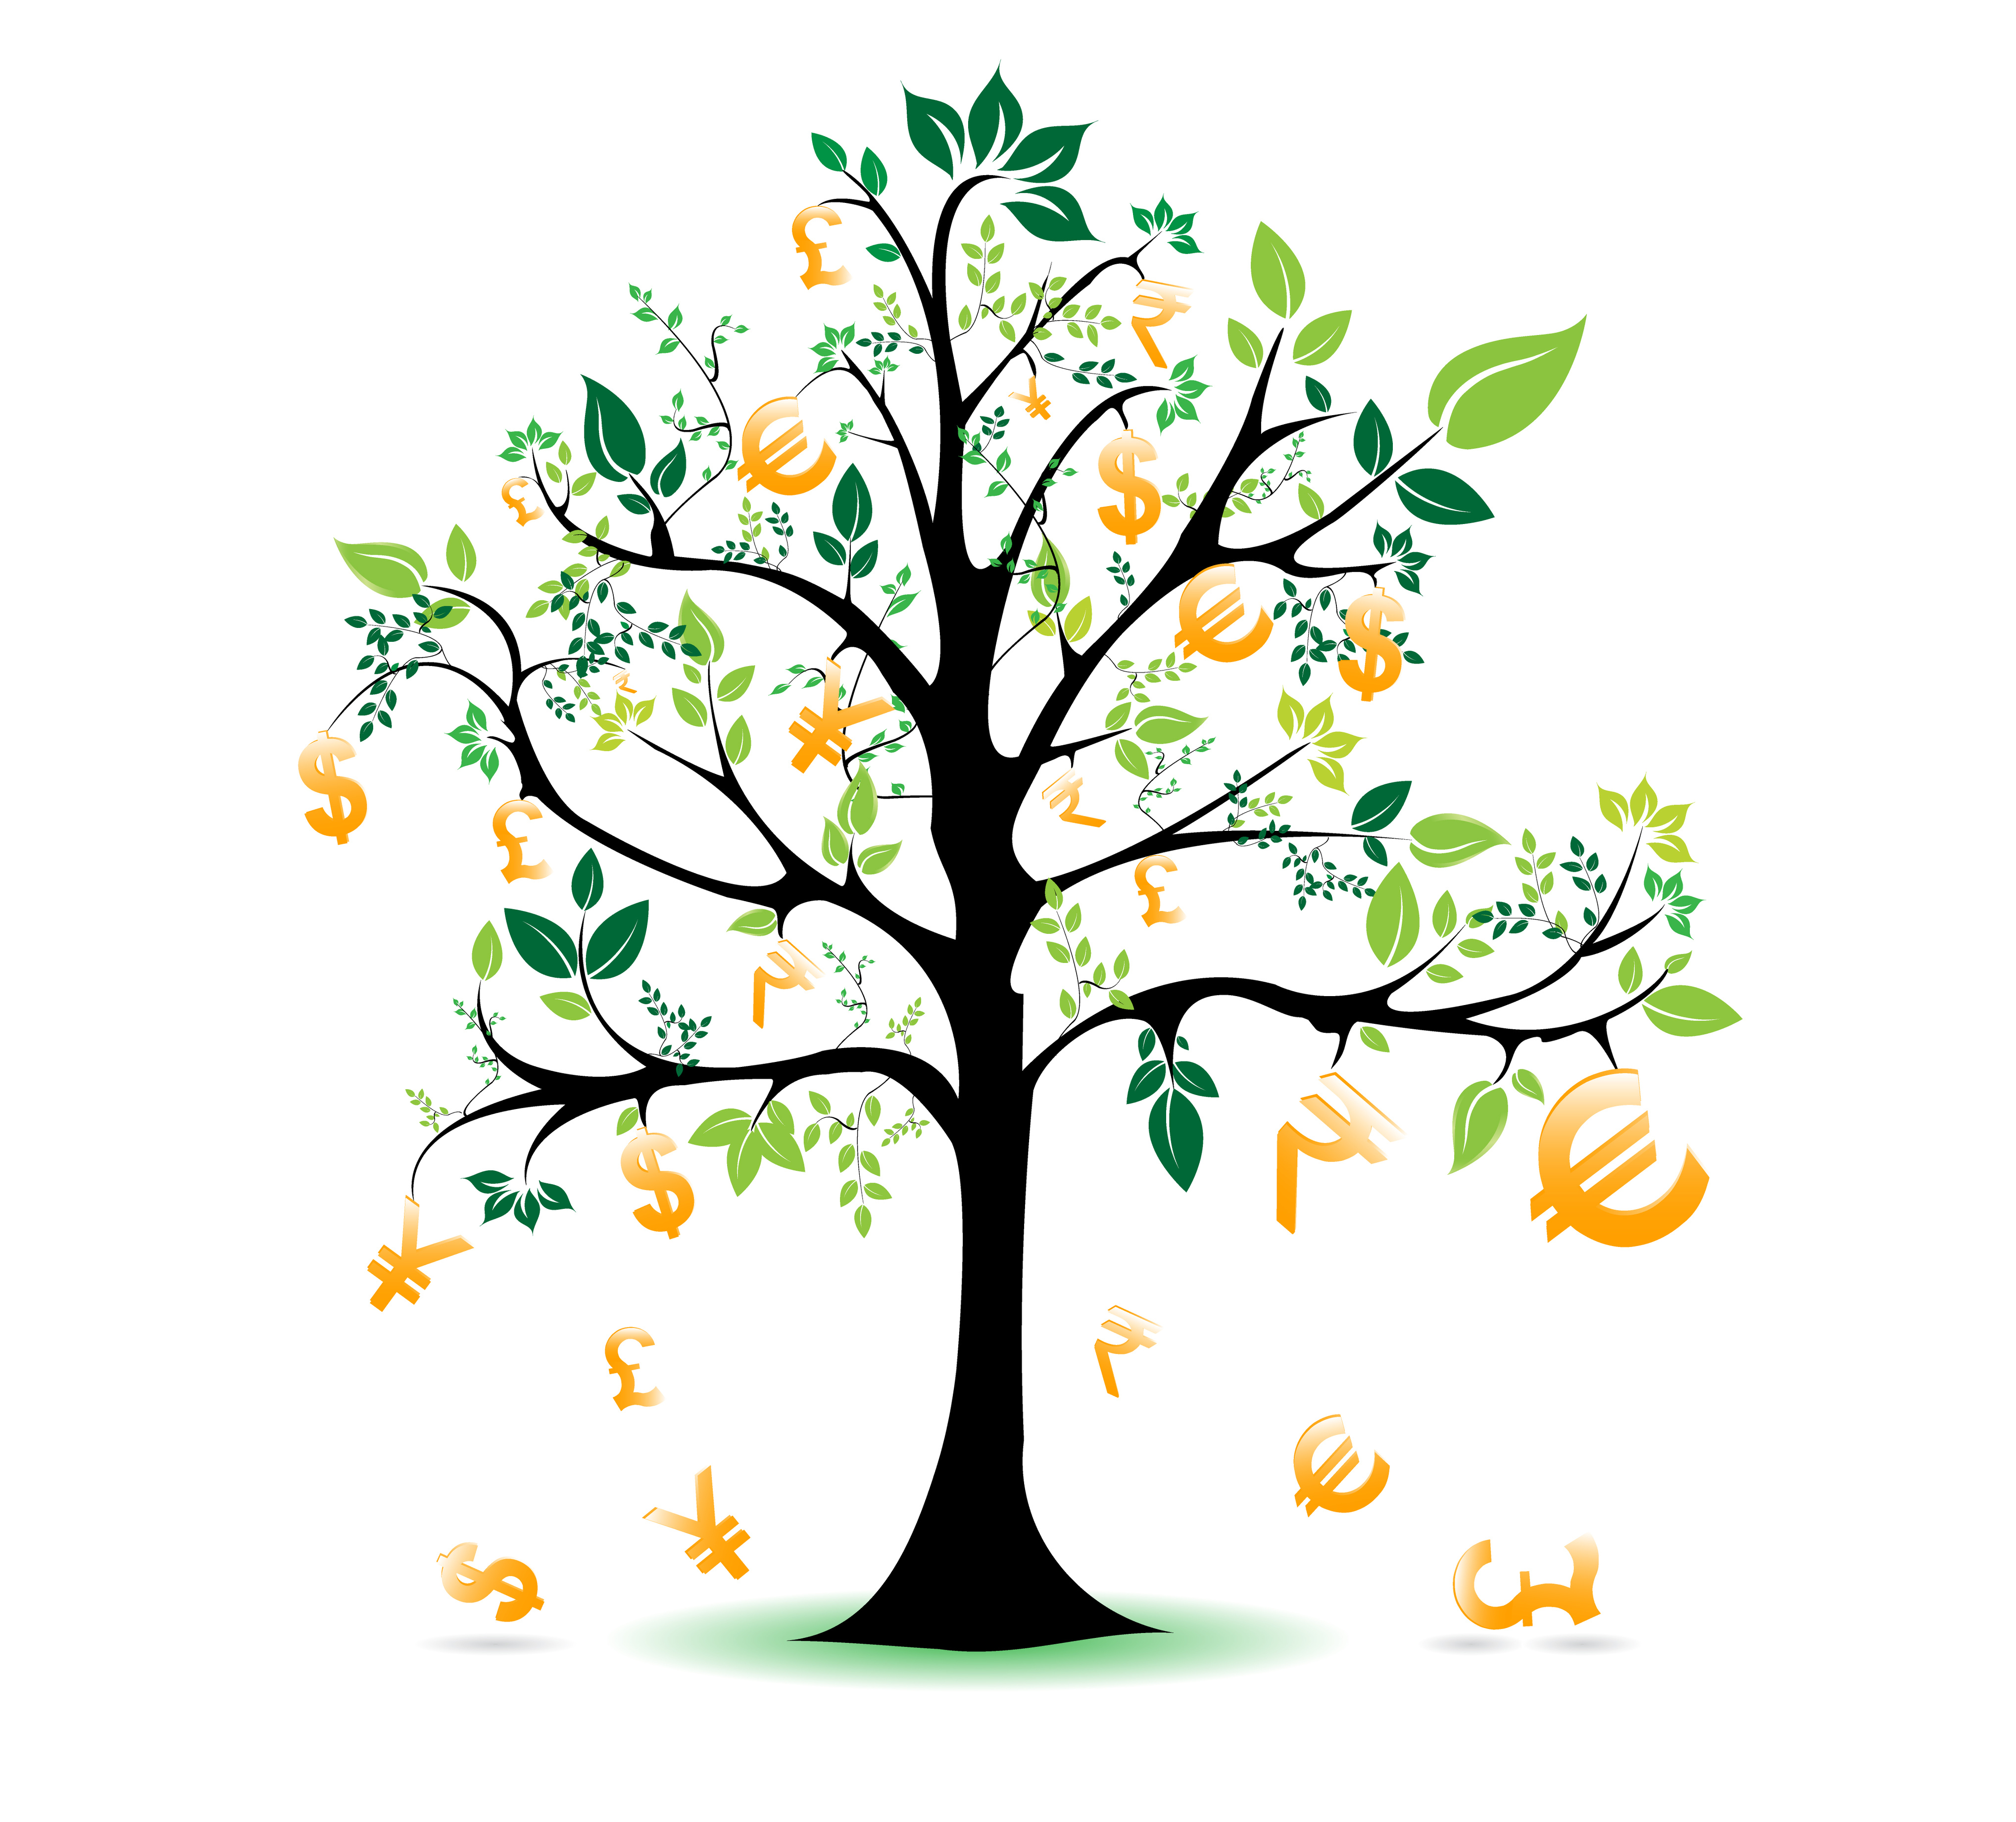 money-tree-images-money-tree-2.jpg